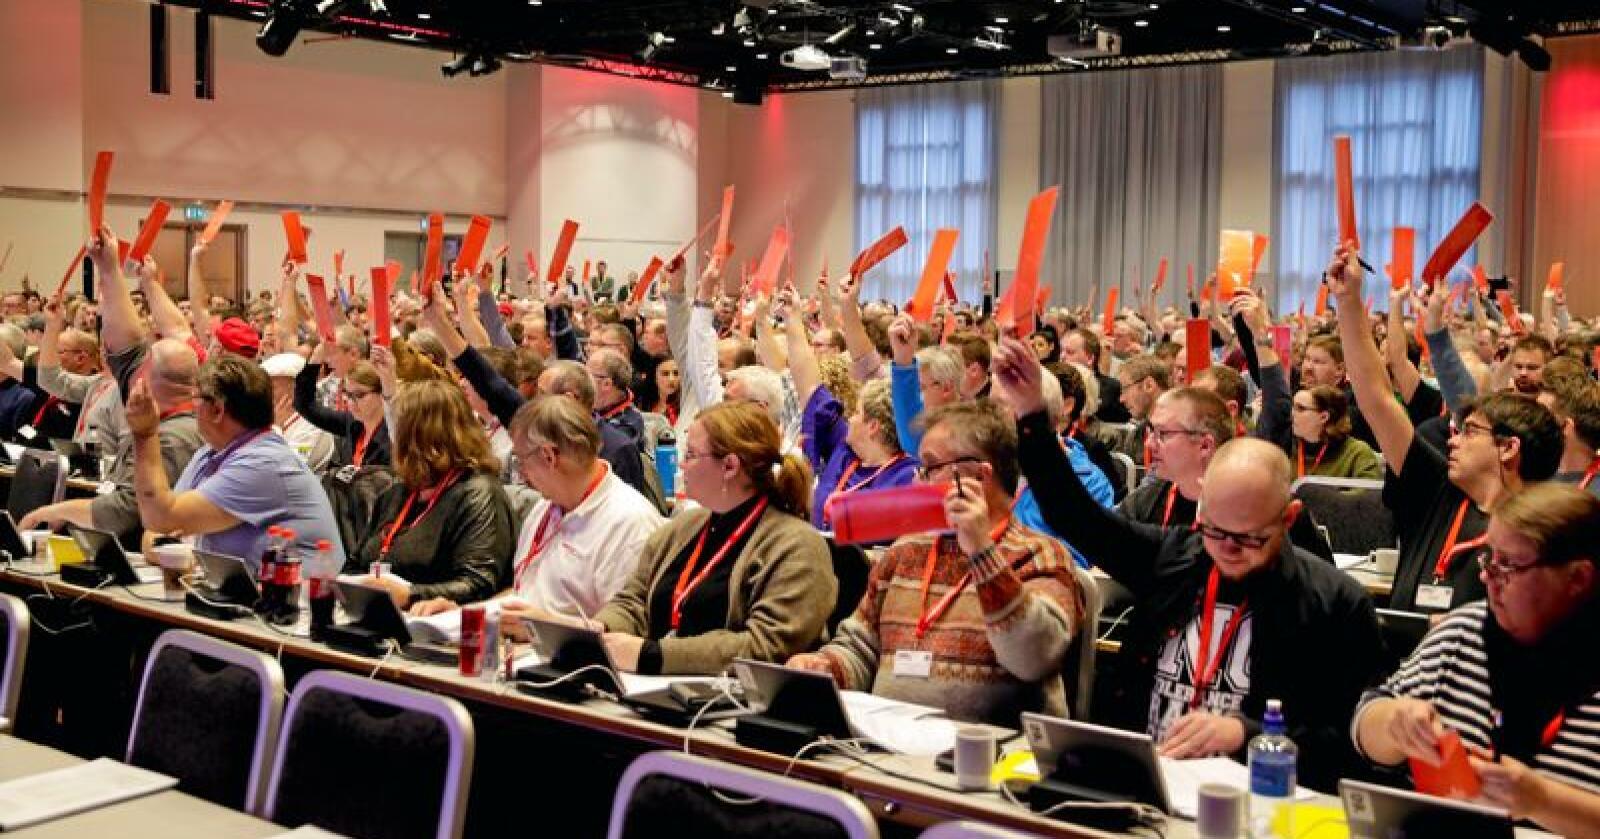 Avsetmning: Fellesforbundets landsmøte stemte over EØS-avtalen. Foto: Vidar Ruud / NTB scanpix